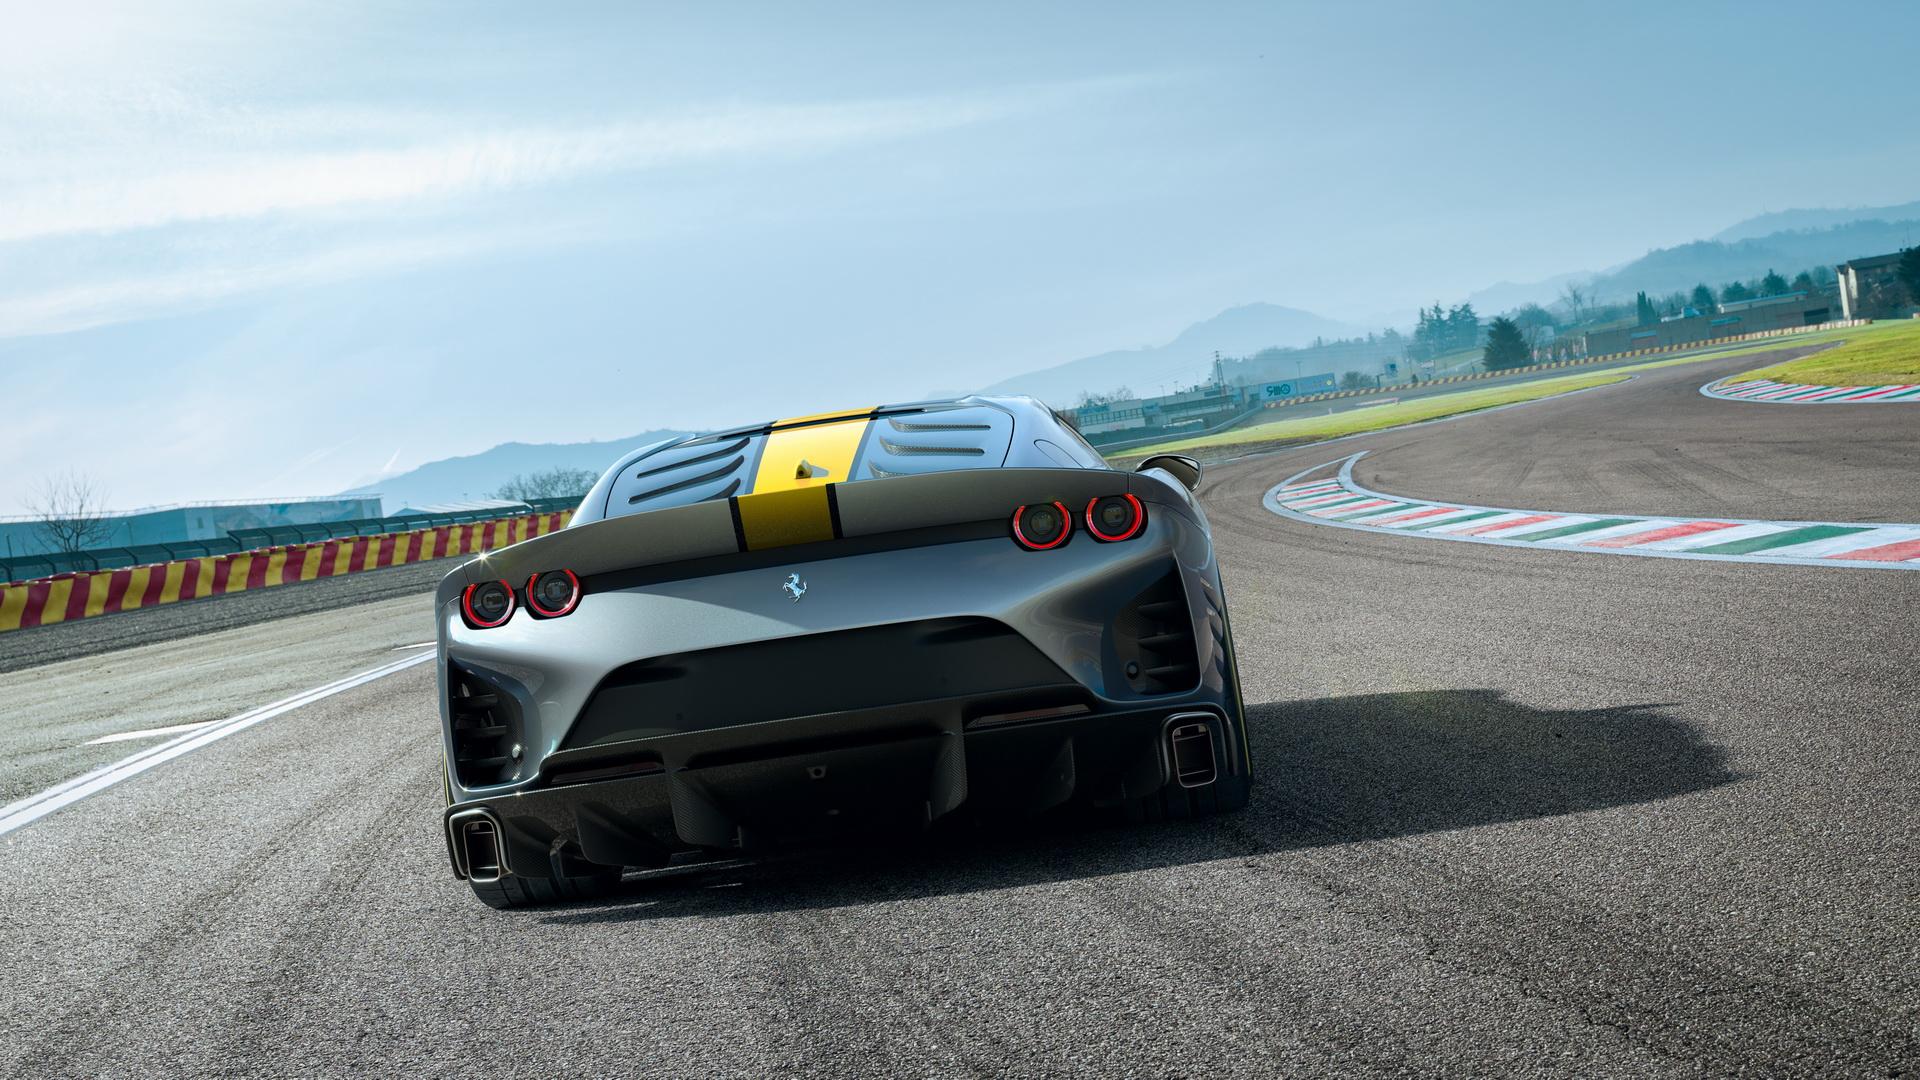 Ferrari-812-giới-hạn-ra-mắt (7).jpg